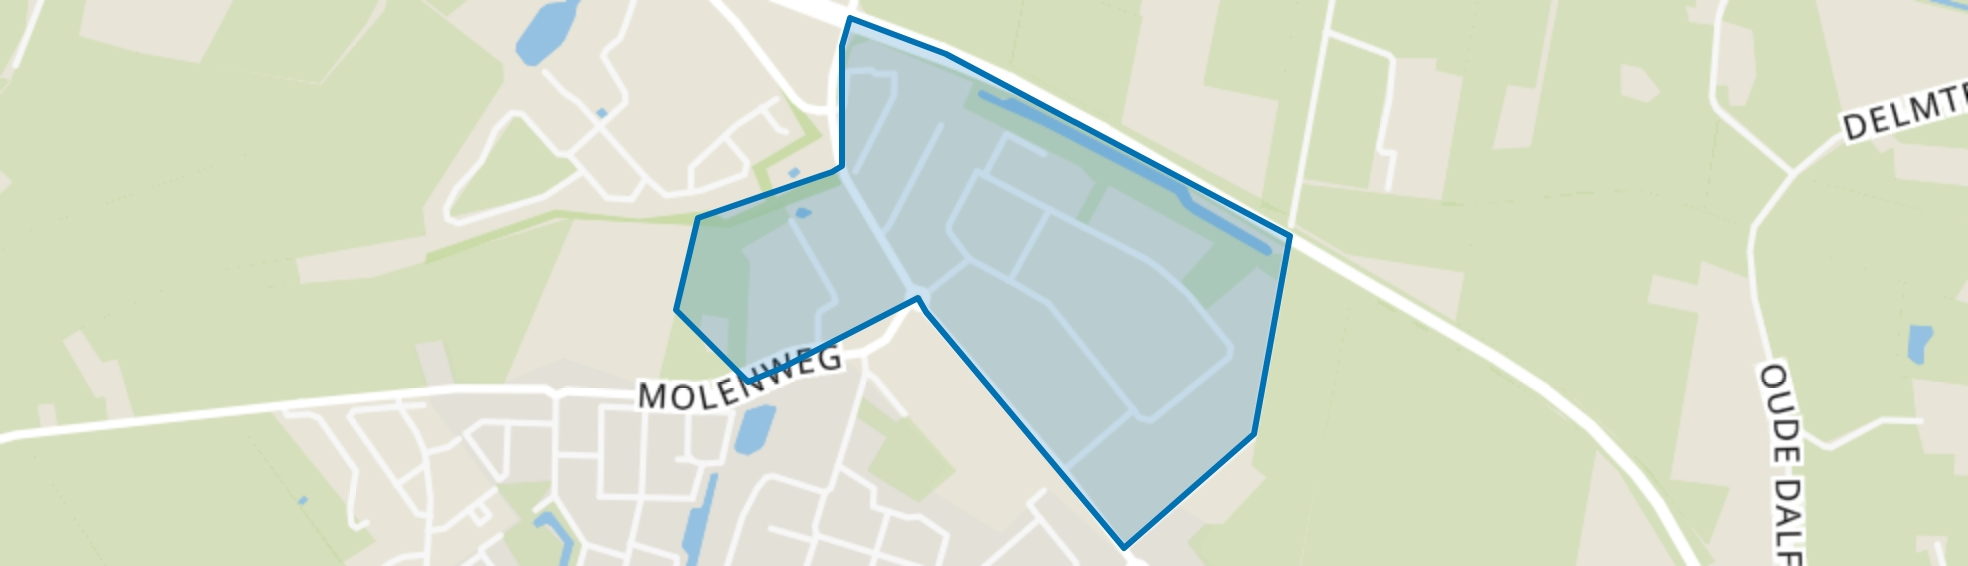 Blankenfoort, Heino map